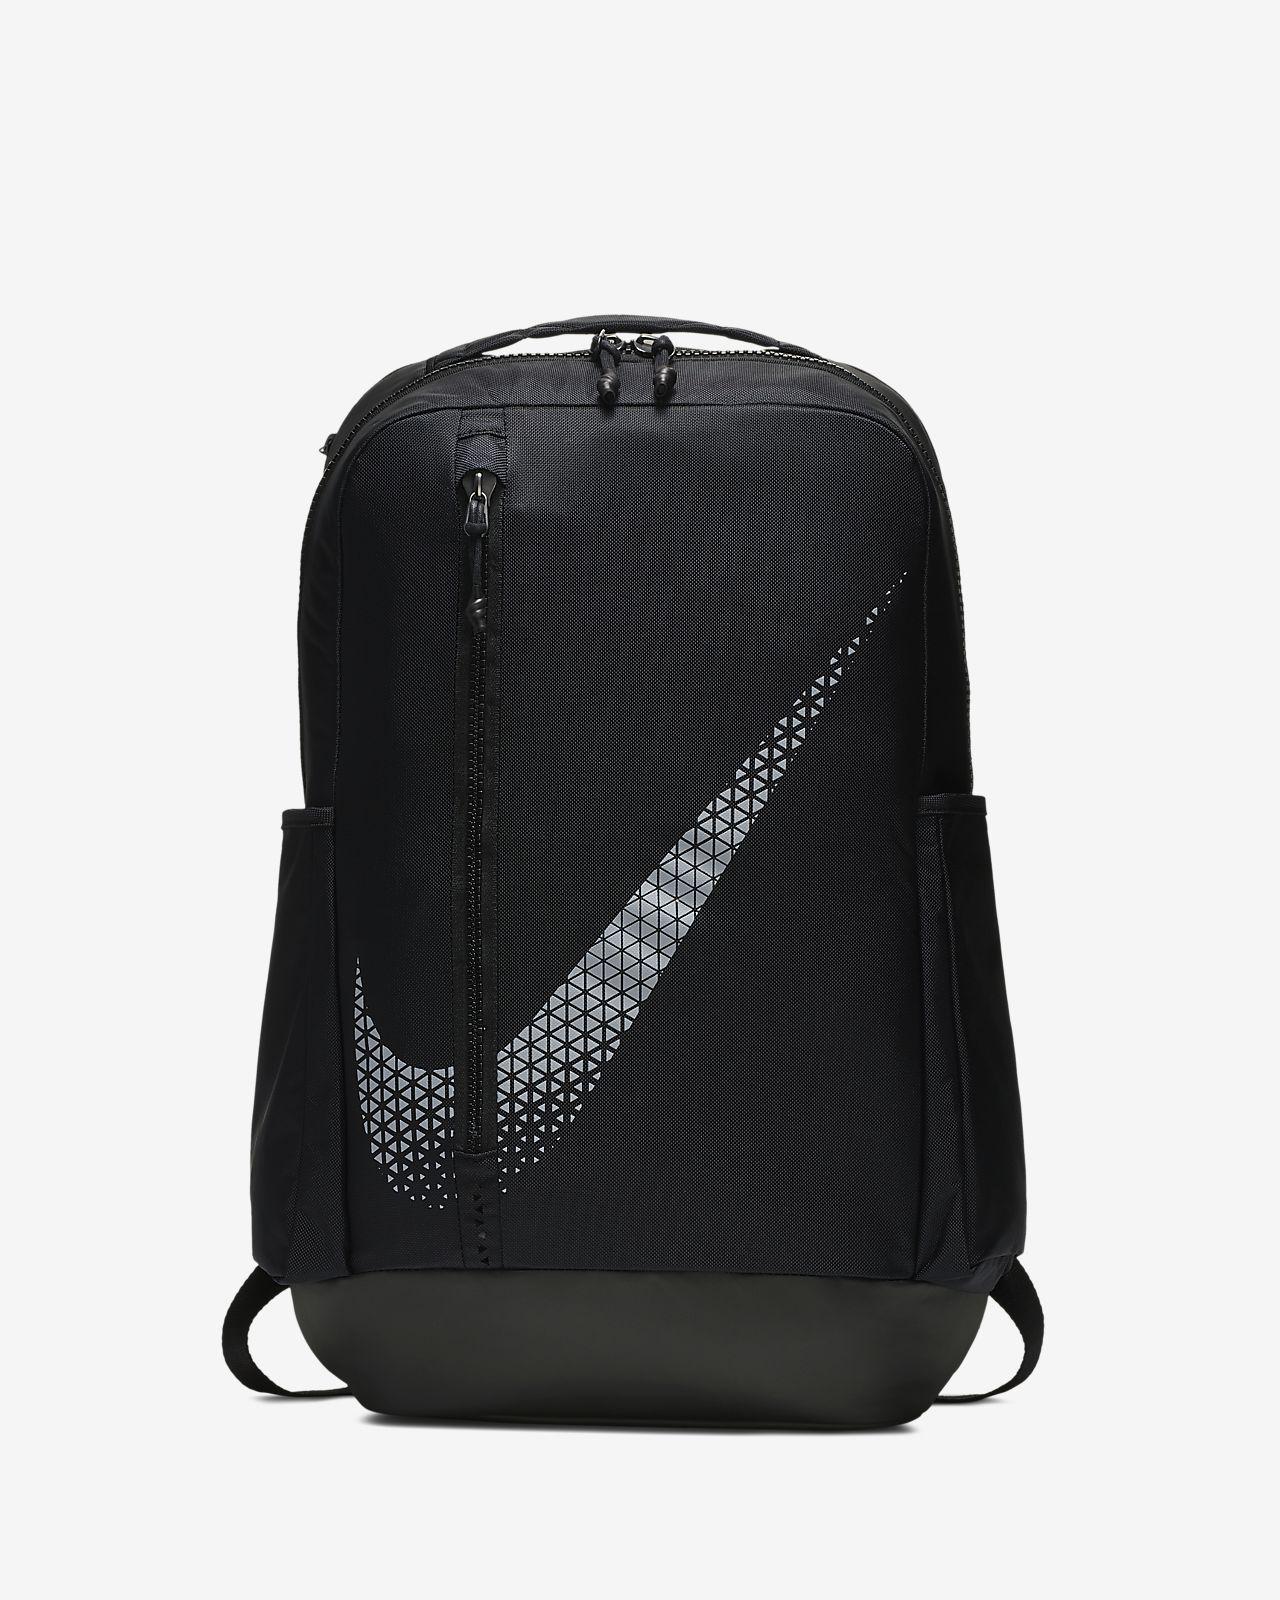 8fd5e01f4b5fd8 Nike Vapor Power Graphic Training Backpack. Nike.com